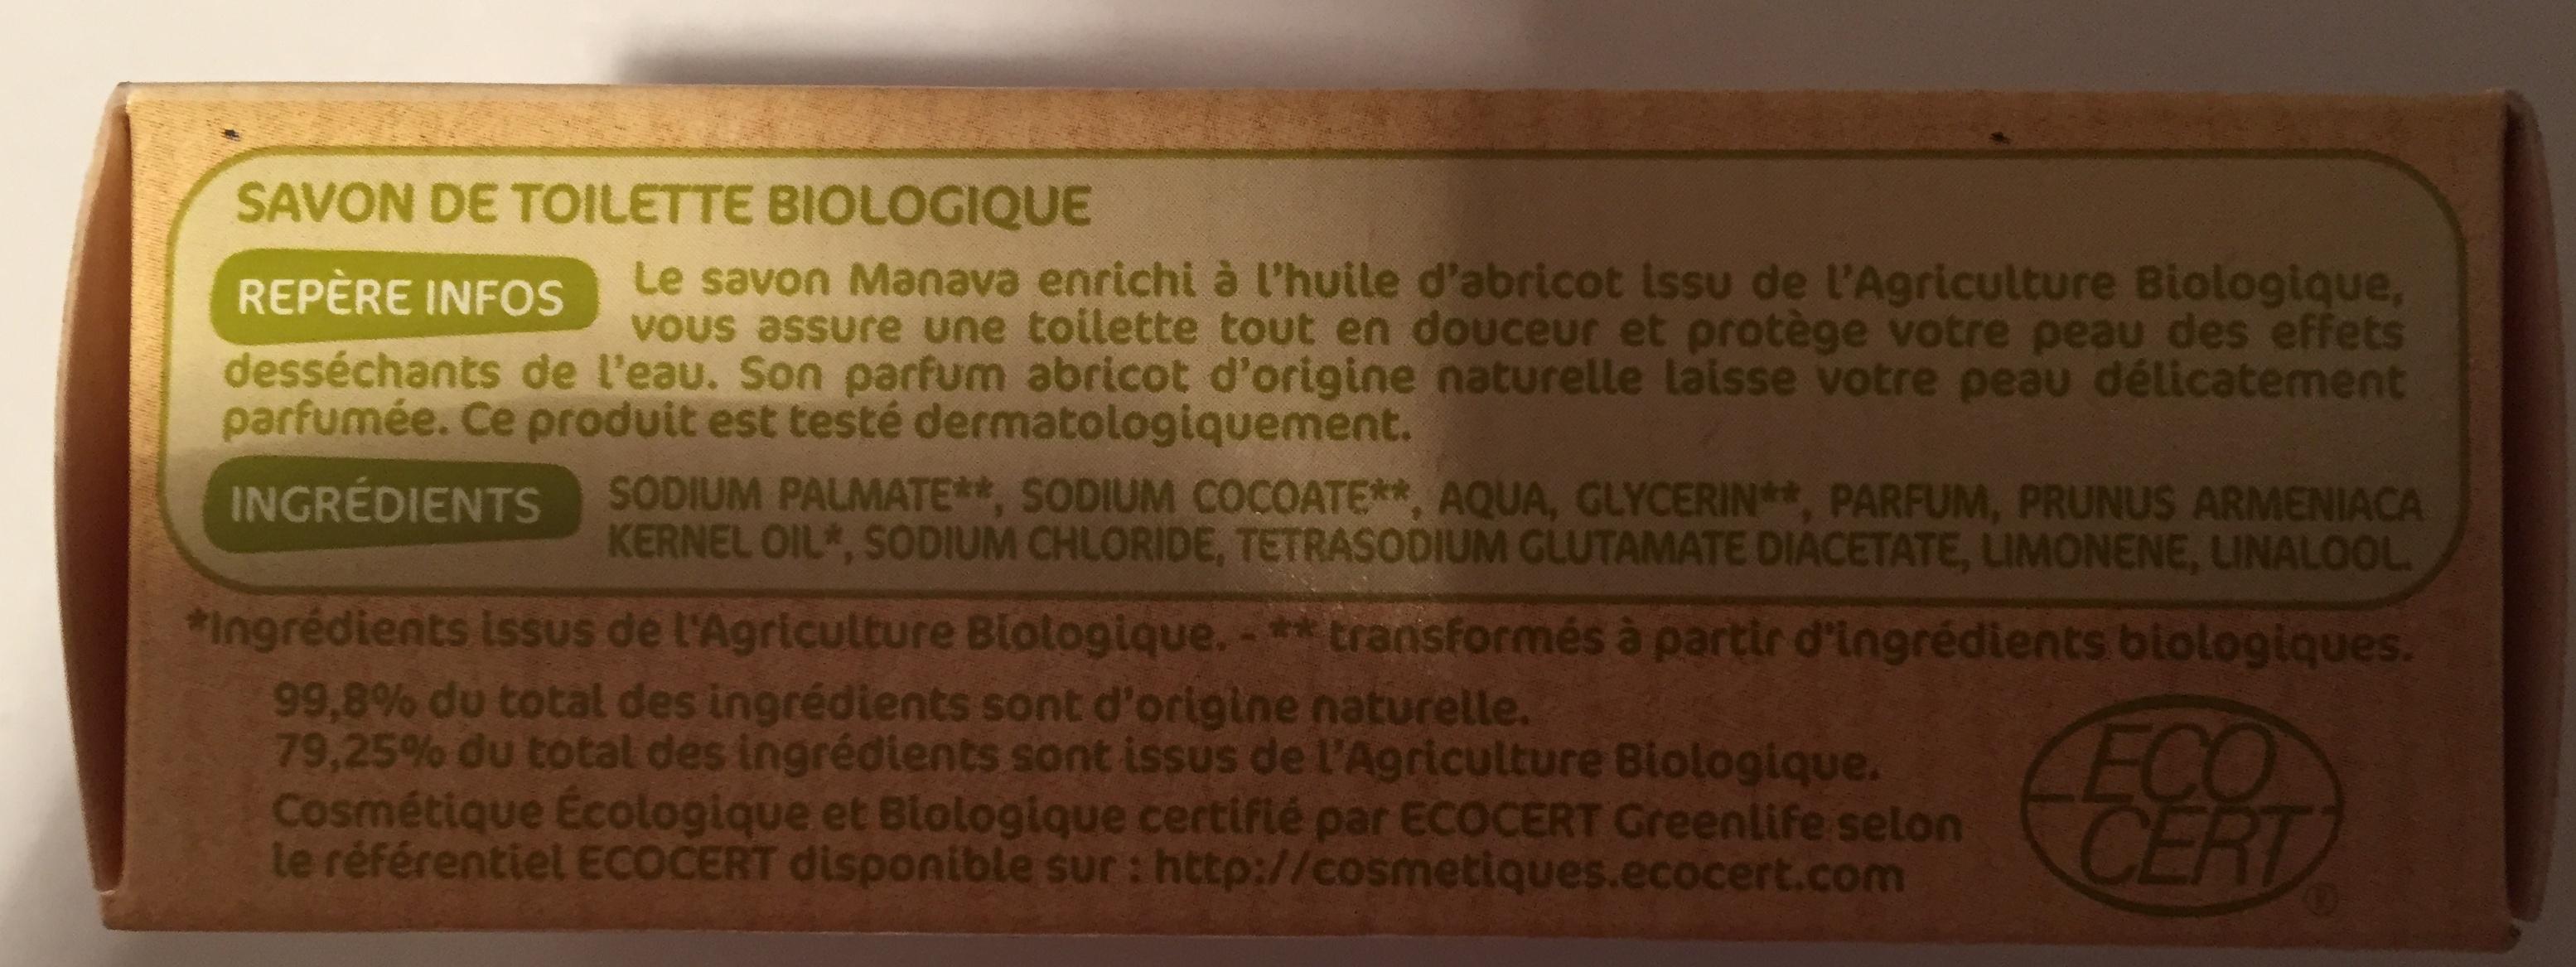 Savon végétal doux Abricot bio - Ingredients